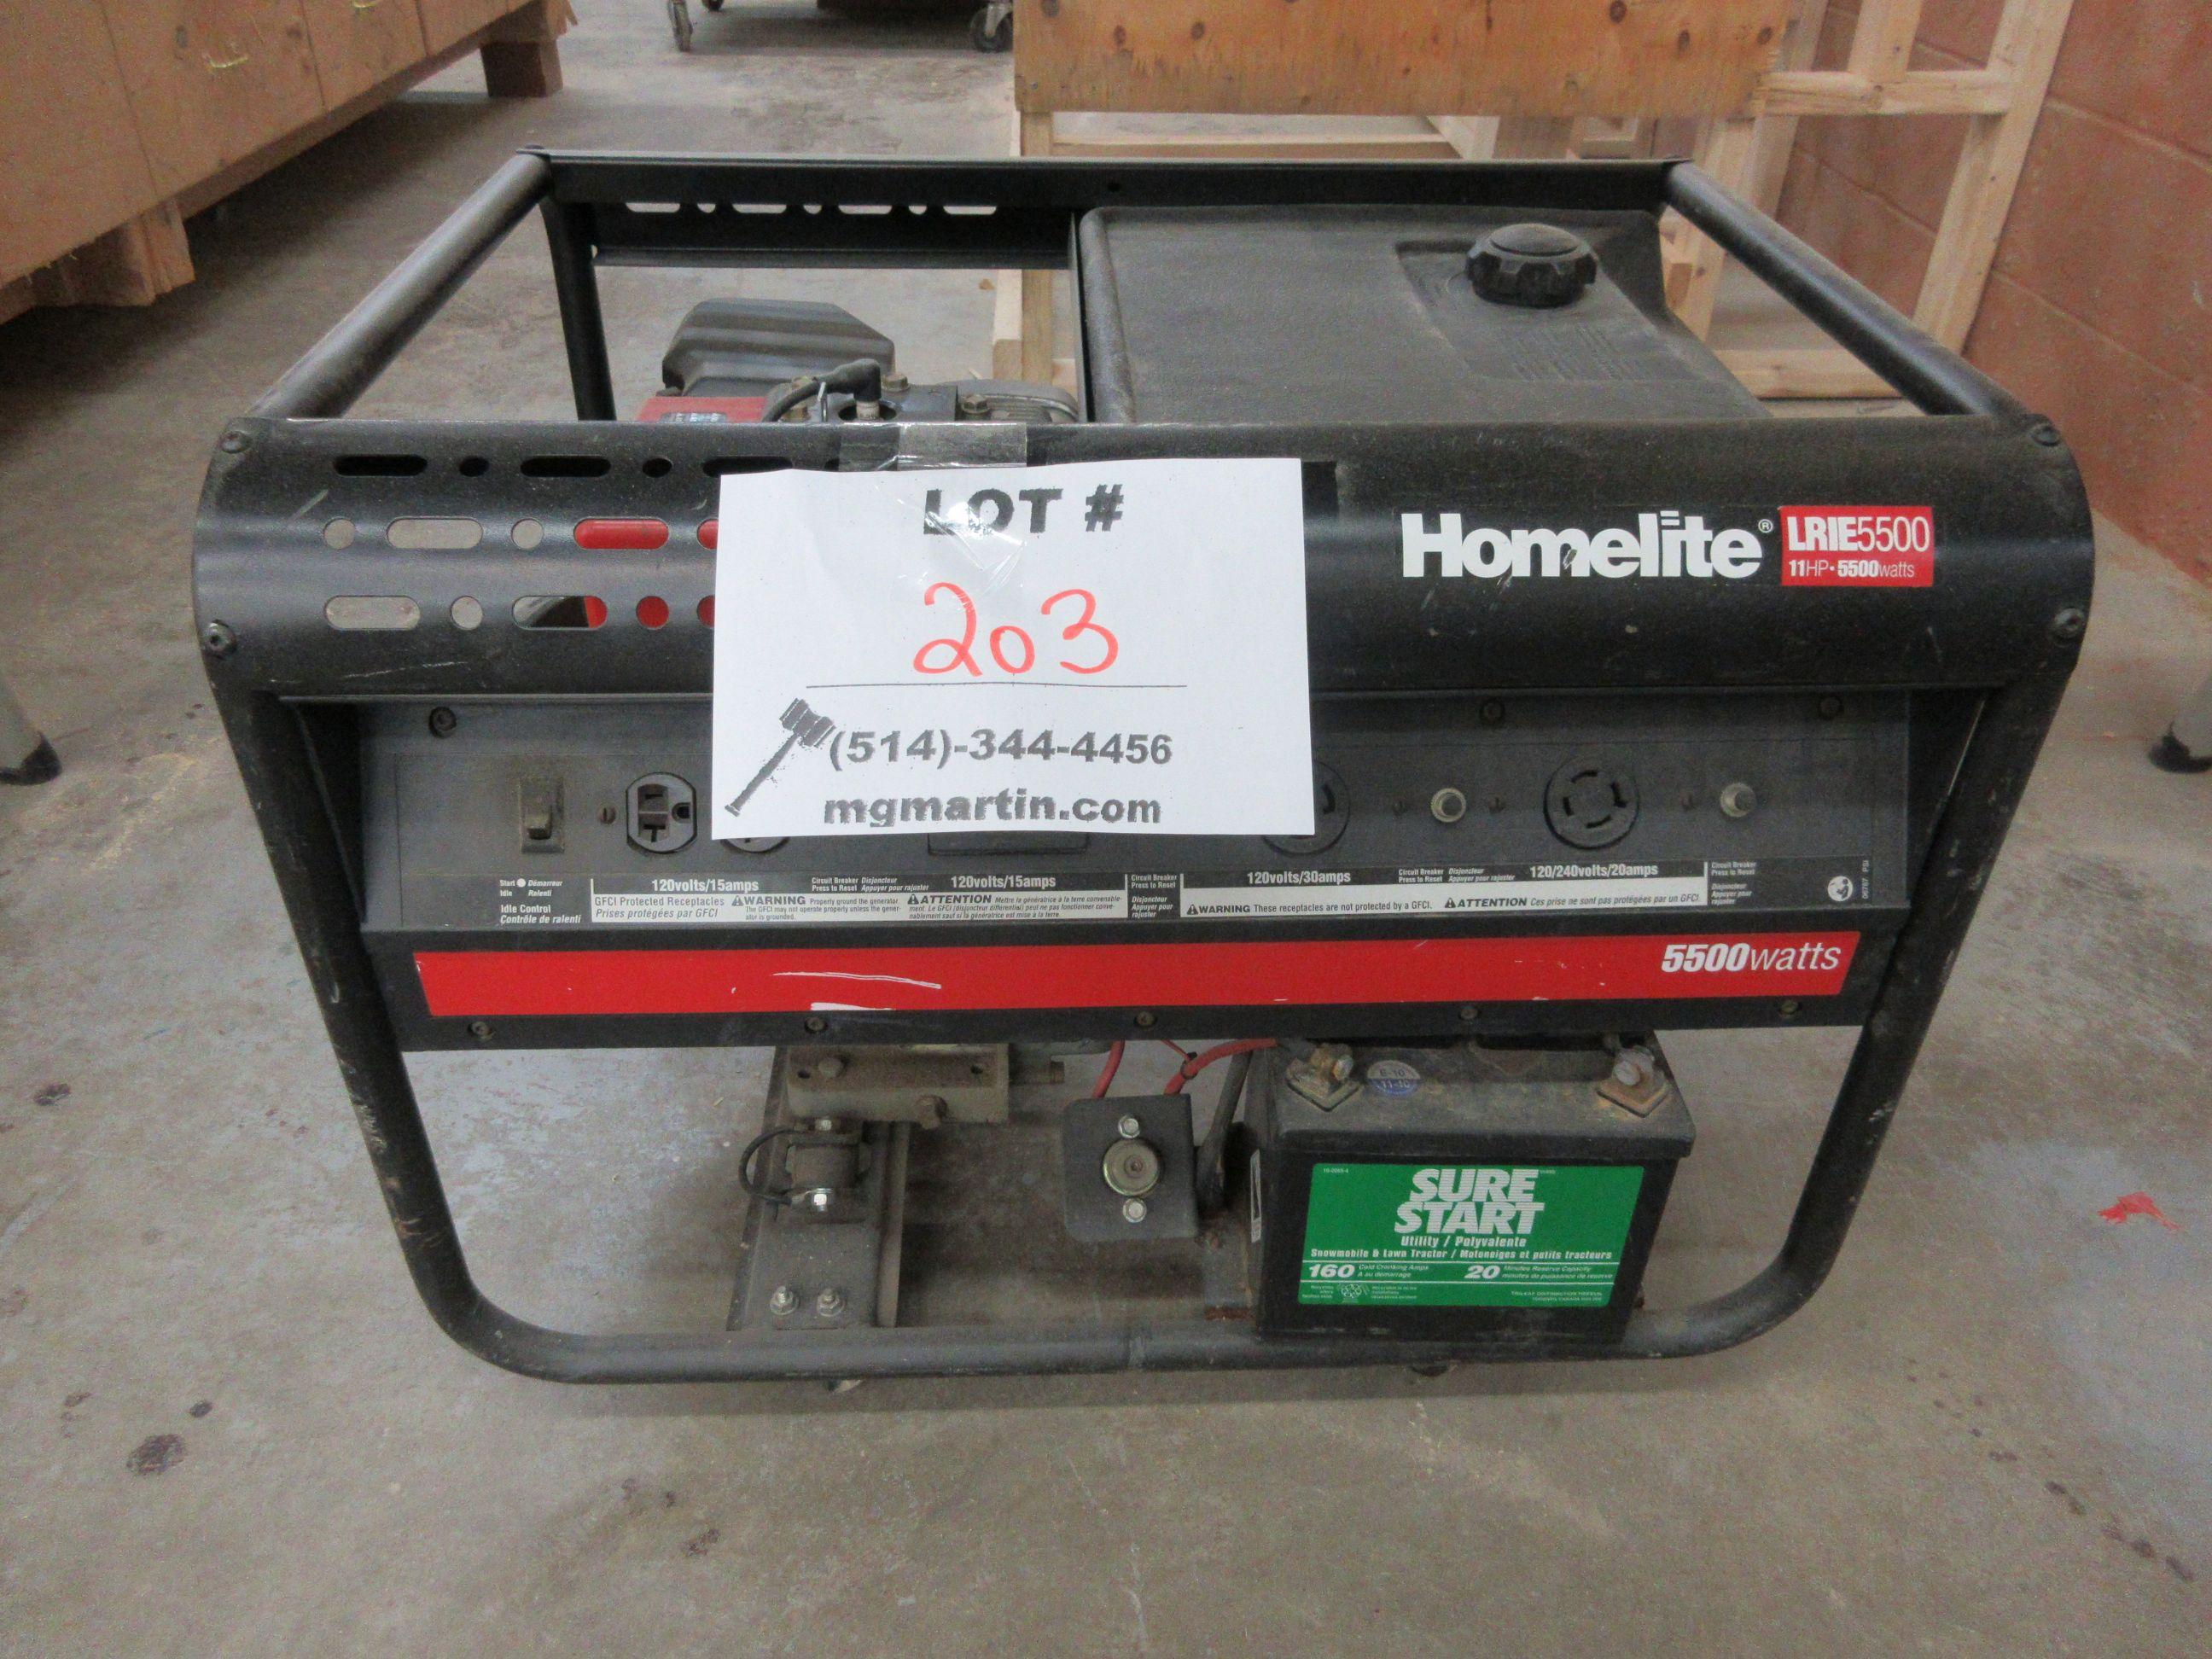 HOMELITE LRIE 5500 generator, 11 HP, 5500 watts